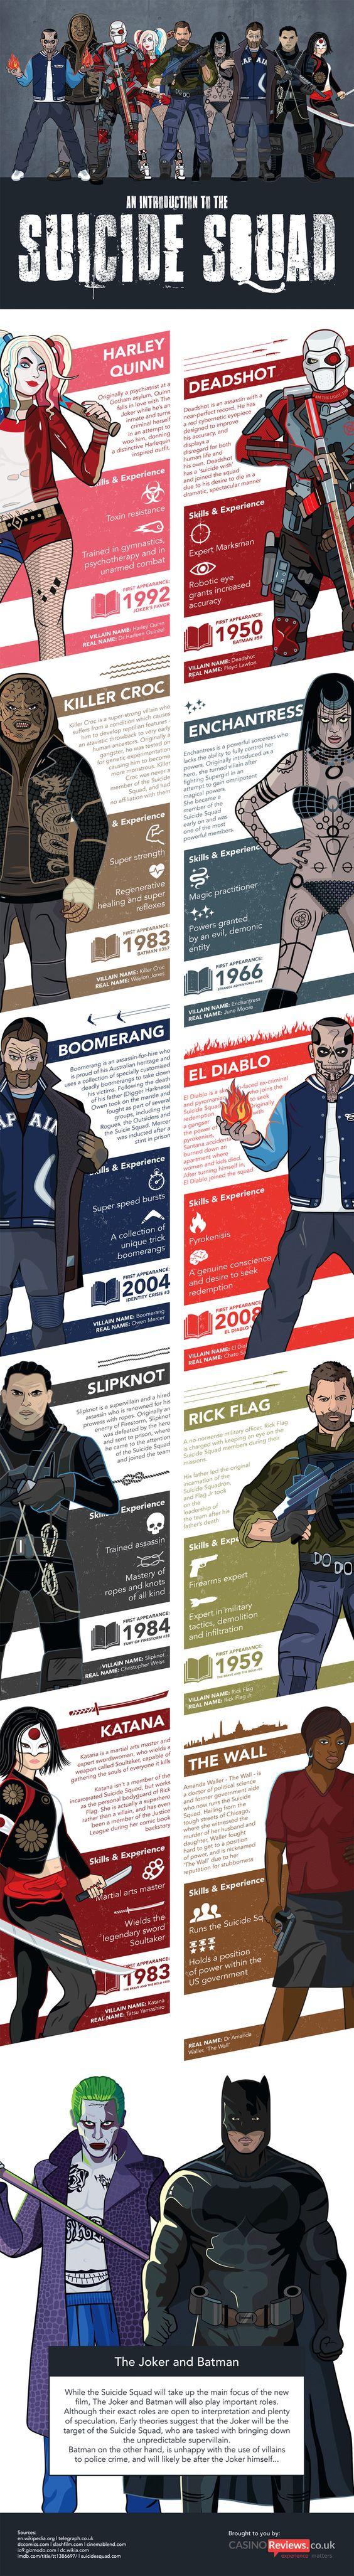 Suicide Squad Characters - Movie Infographic. Topic: dccomics, superhero, film, batman